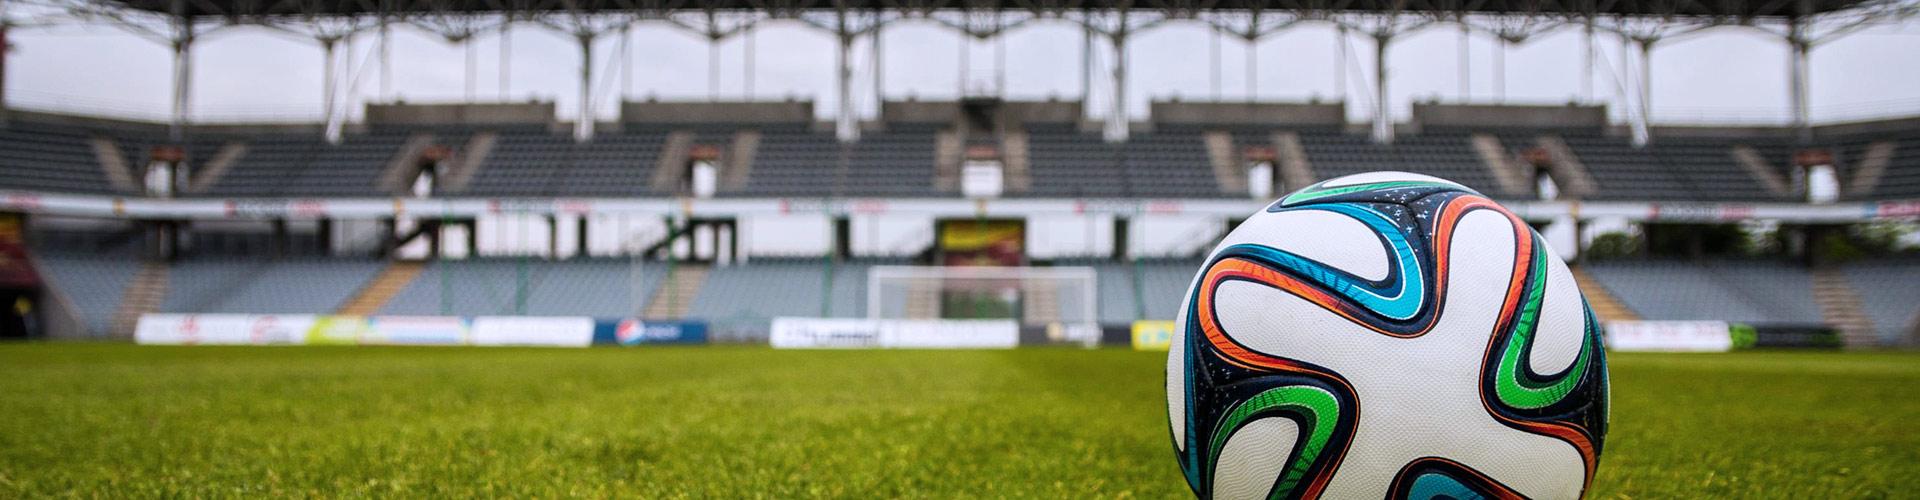 Intelligent fire alarm technology: trouble-free football enjoyment